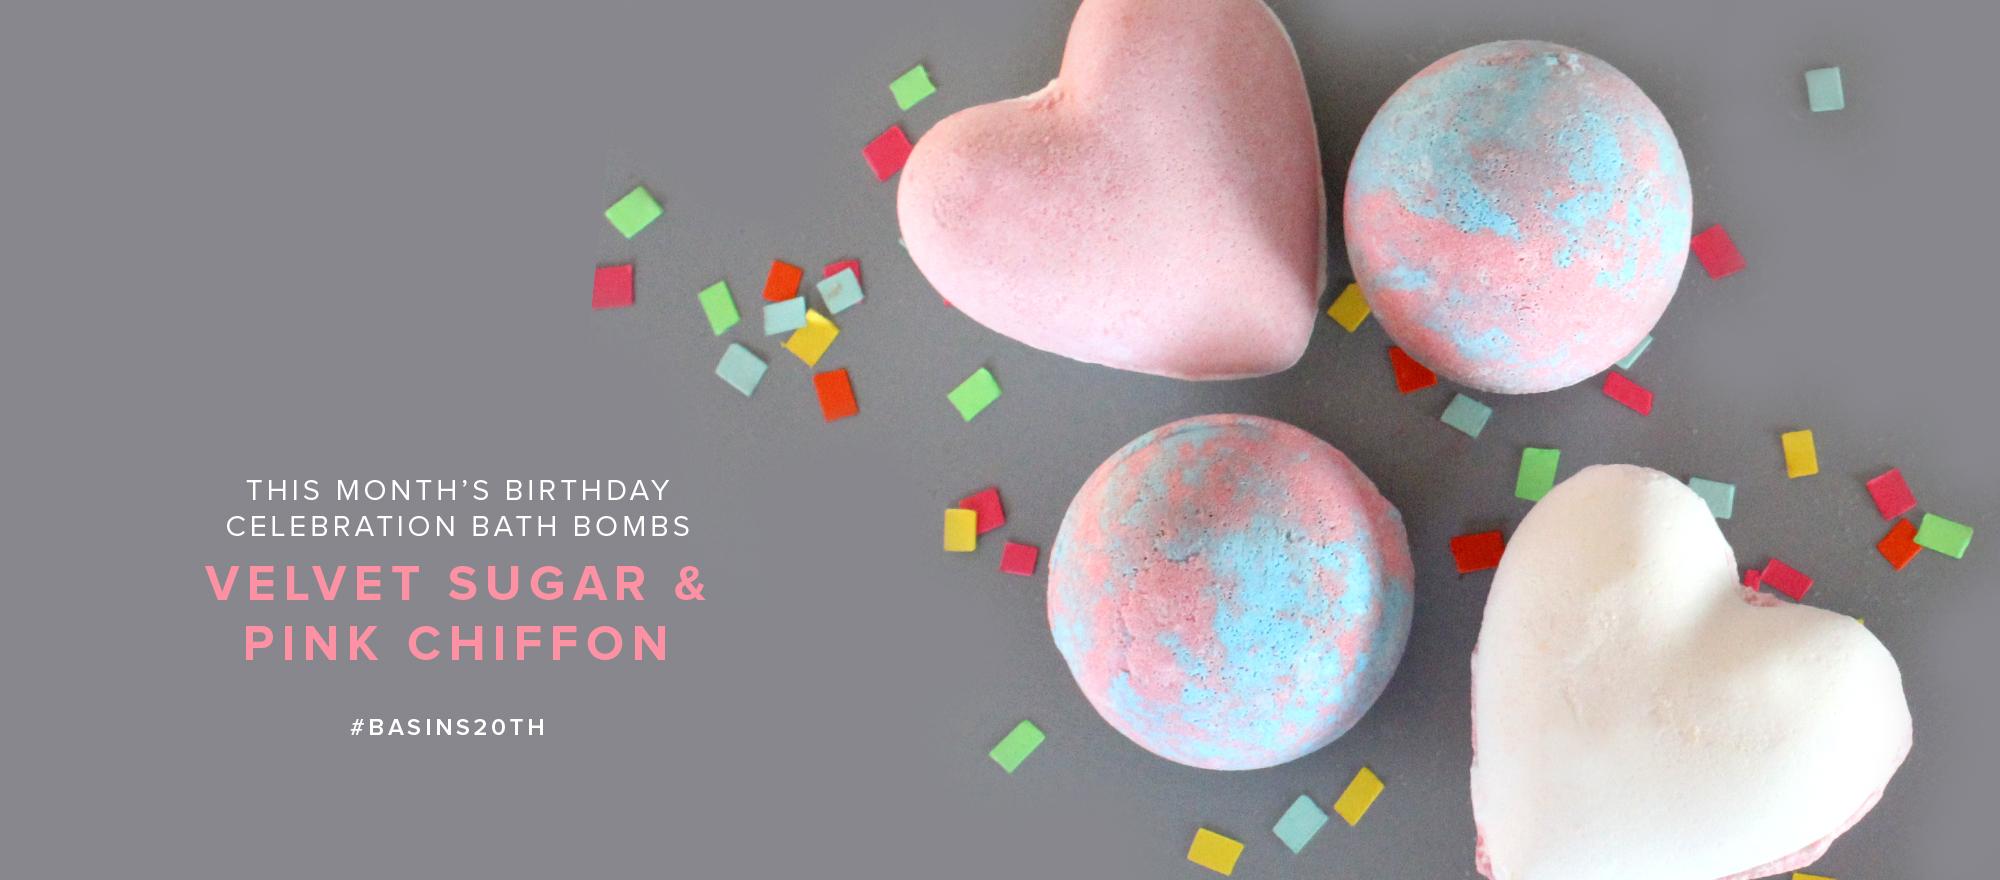 Velvet Sugar & Pink Chiffon